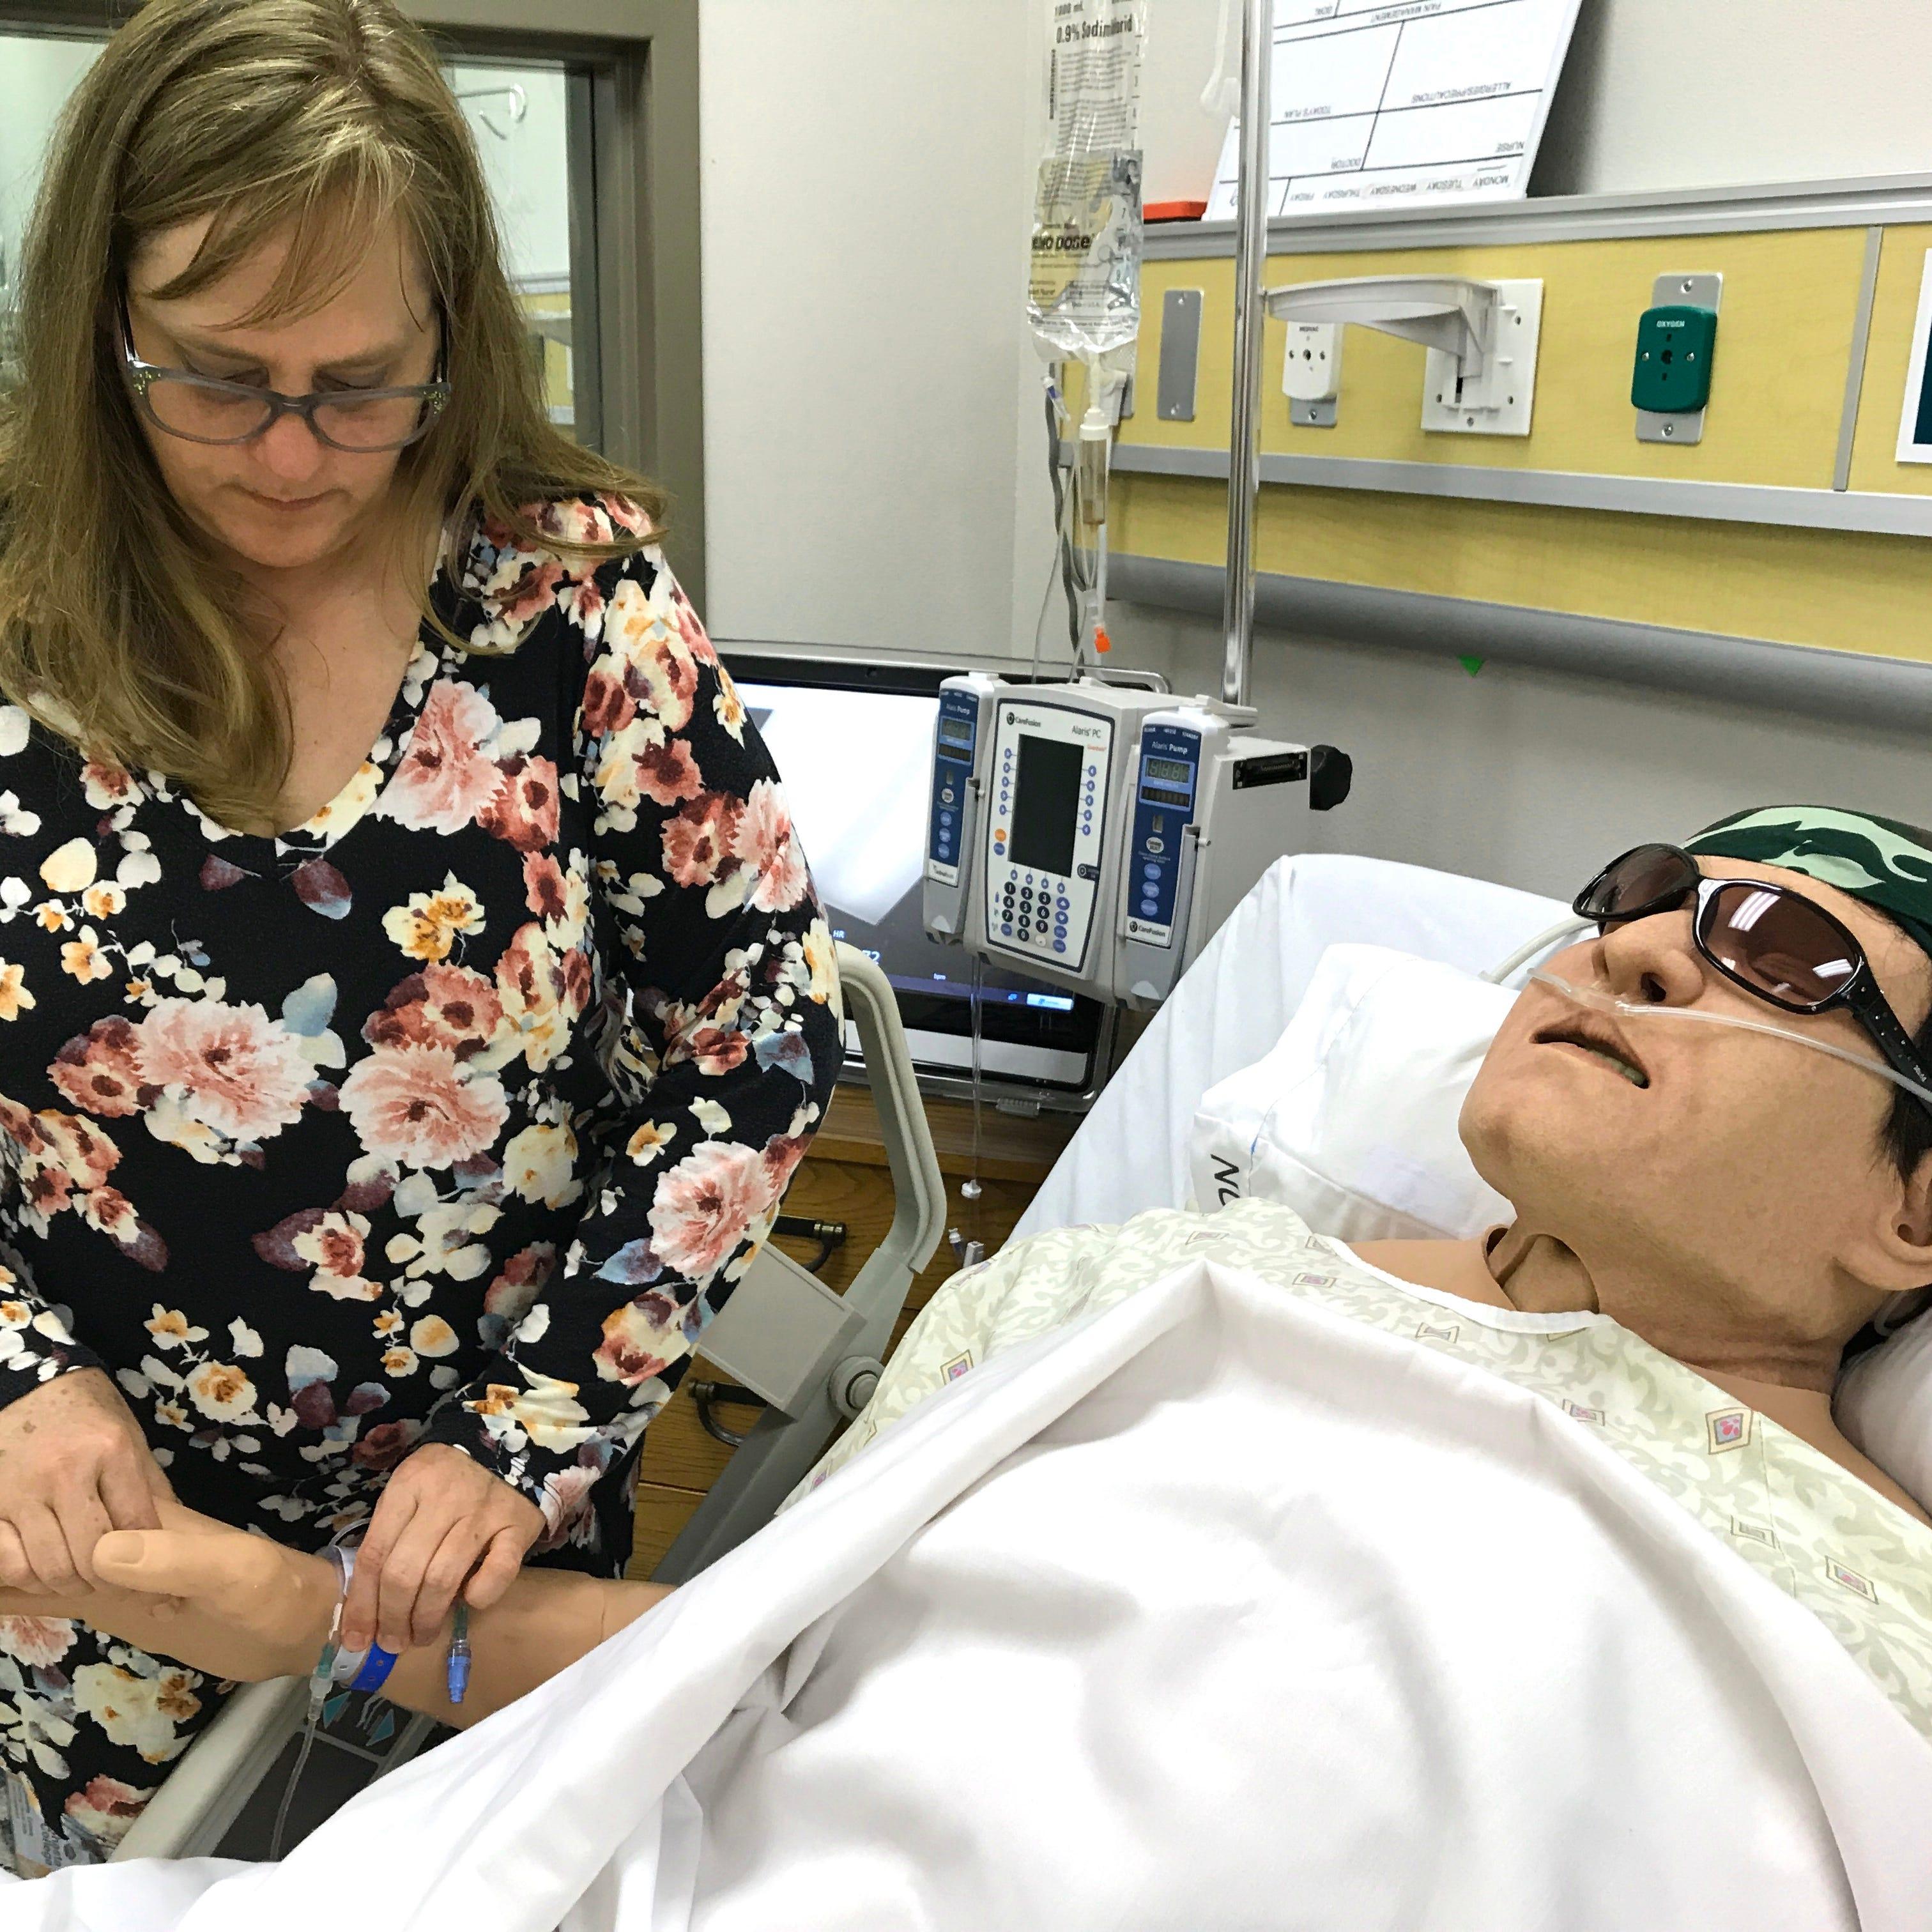 Human-like robots are helping train nurses in Redding